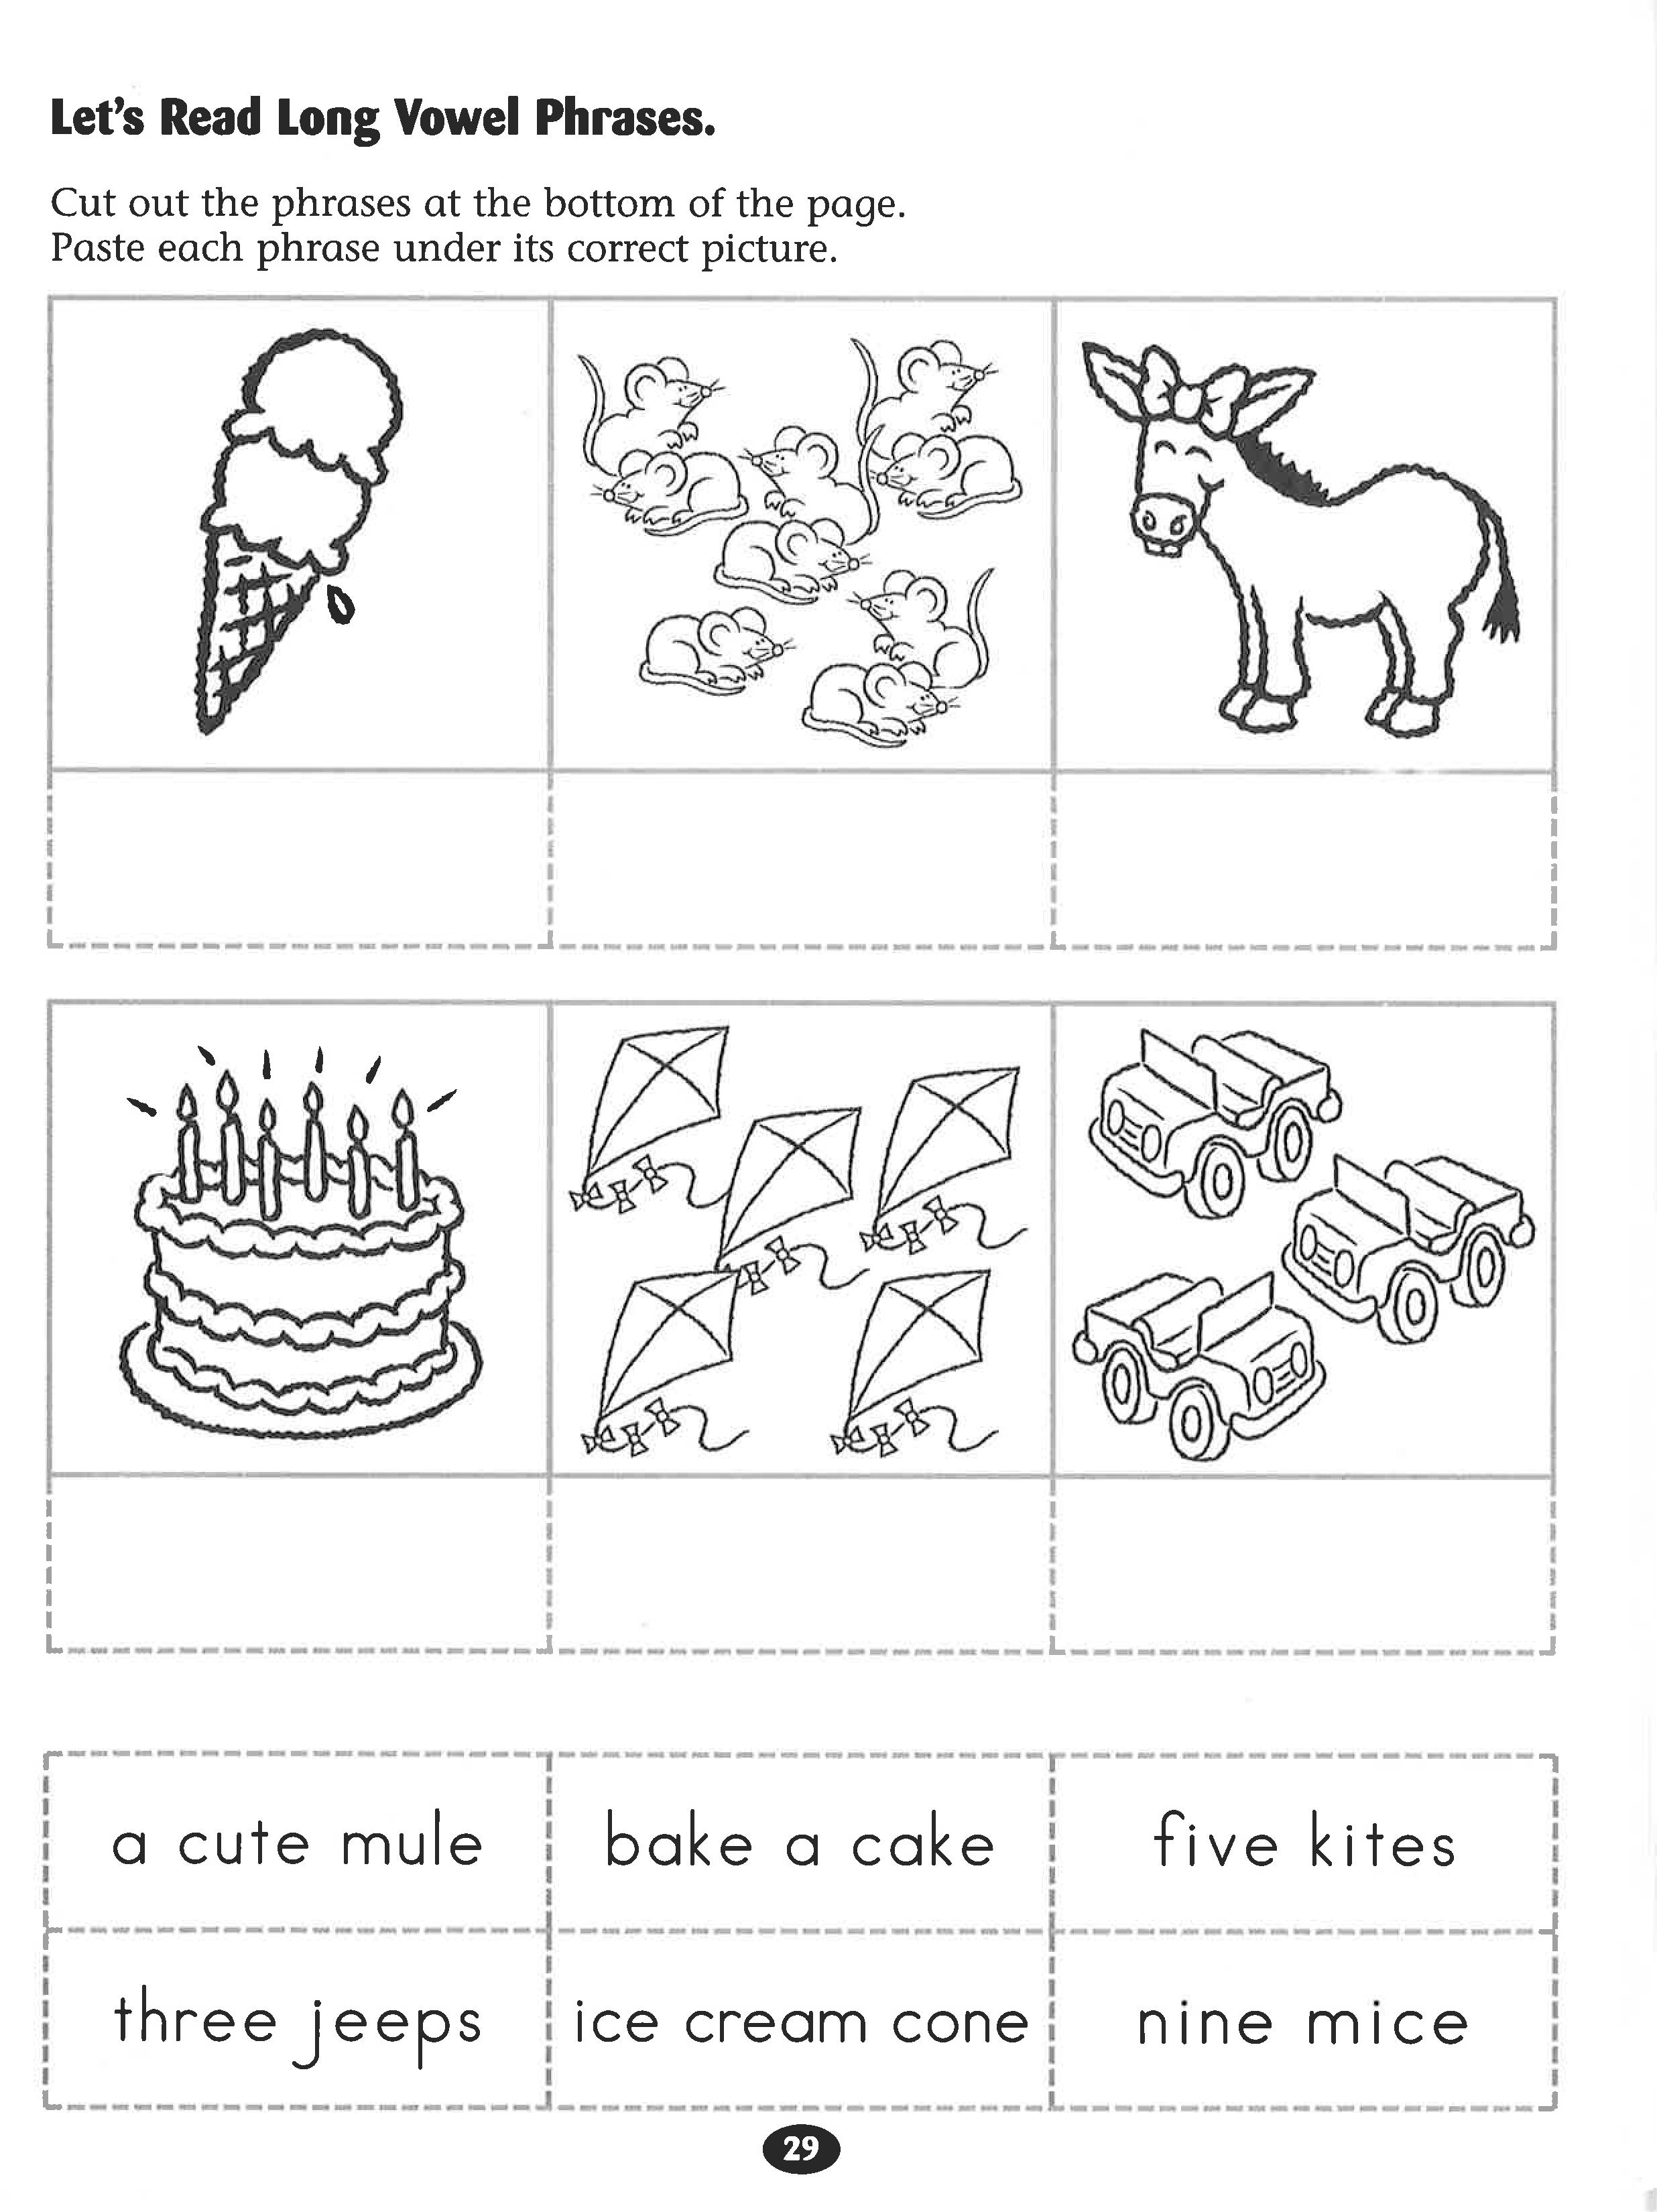 Let S Read Long Vowel Phrases Worksheet